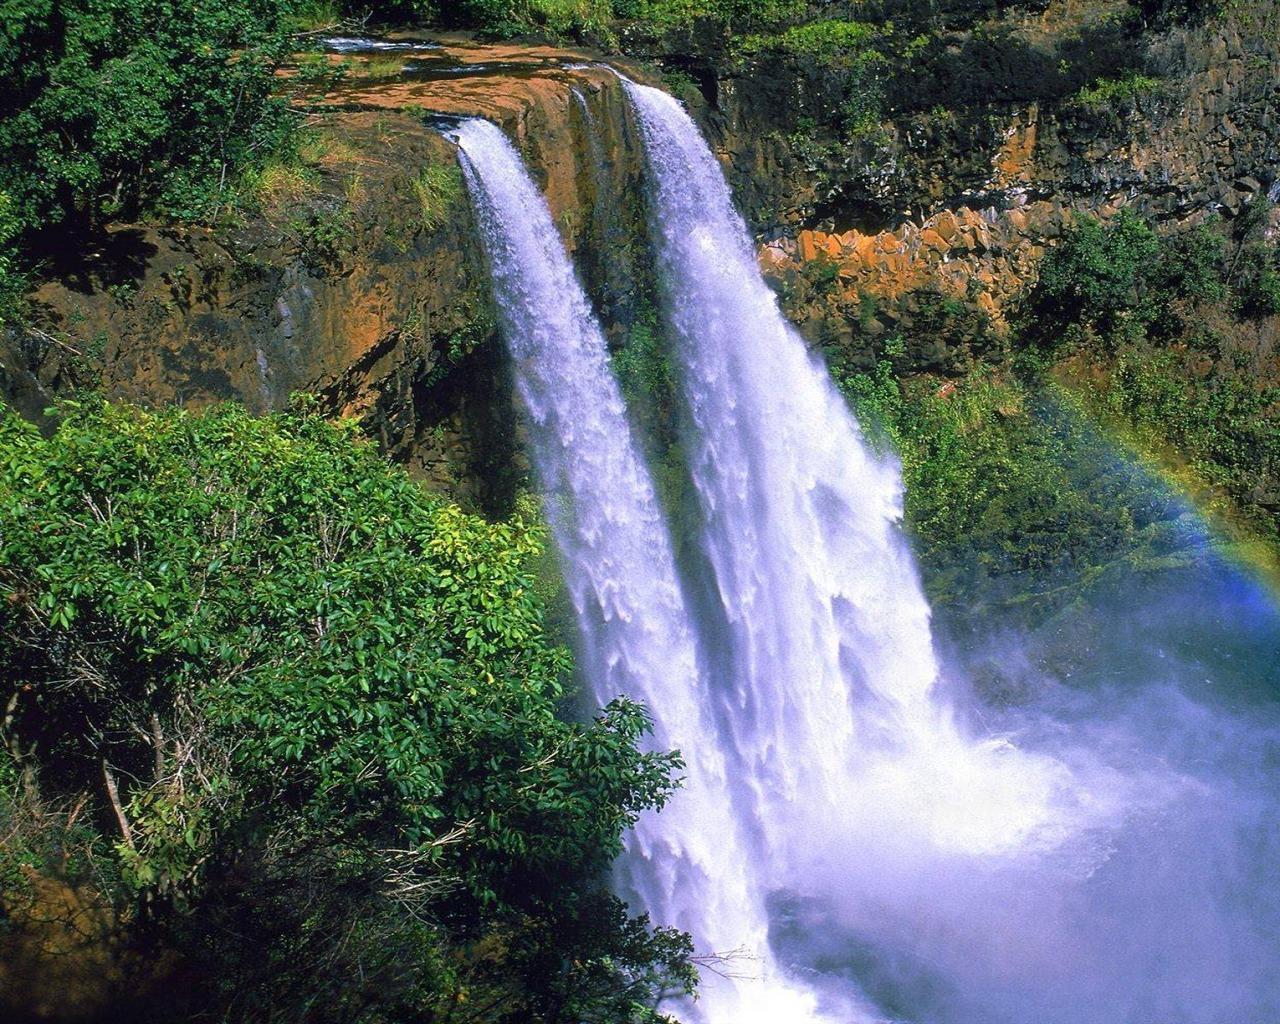 9 Spectacular Hd Waterfall Wallpapers To Download: Spectacular Waterfalls Widescreen Desktop Wallpaper 11